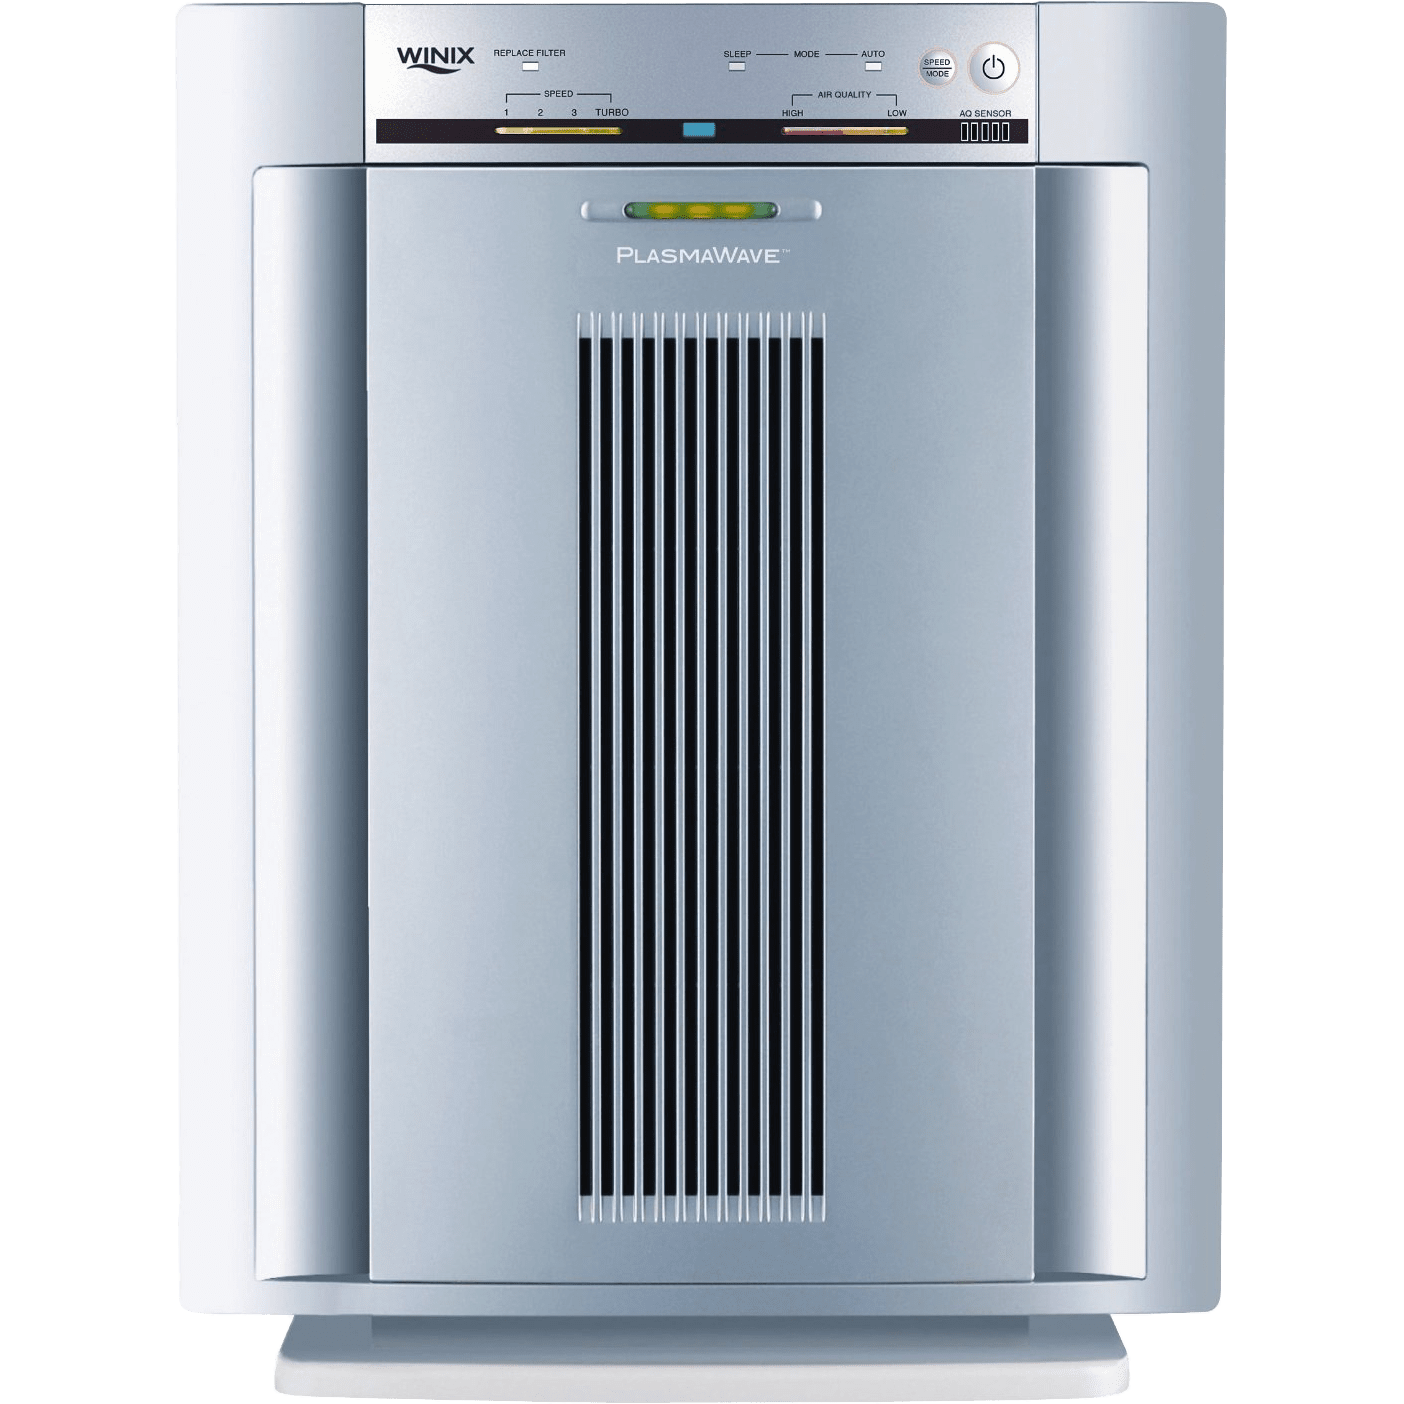 Winix Plasmawave 5300 Air Cleaner Free Shipping Sylvane